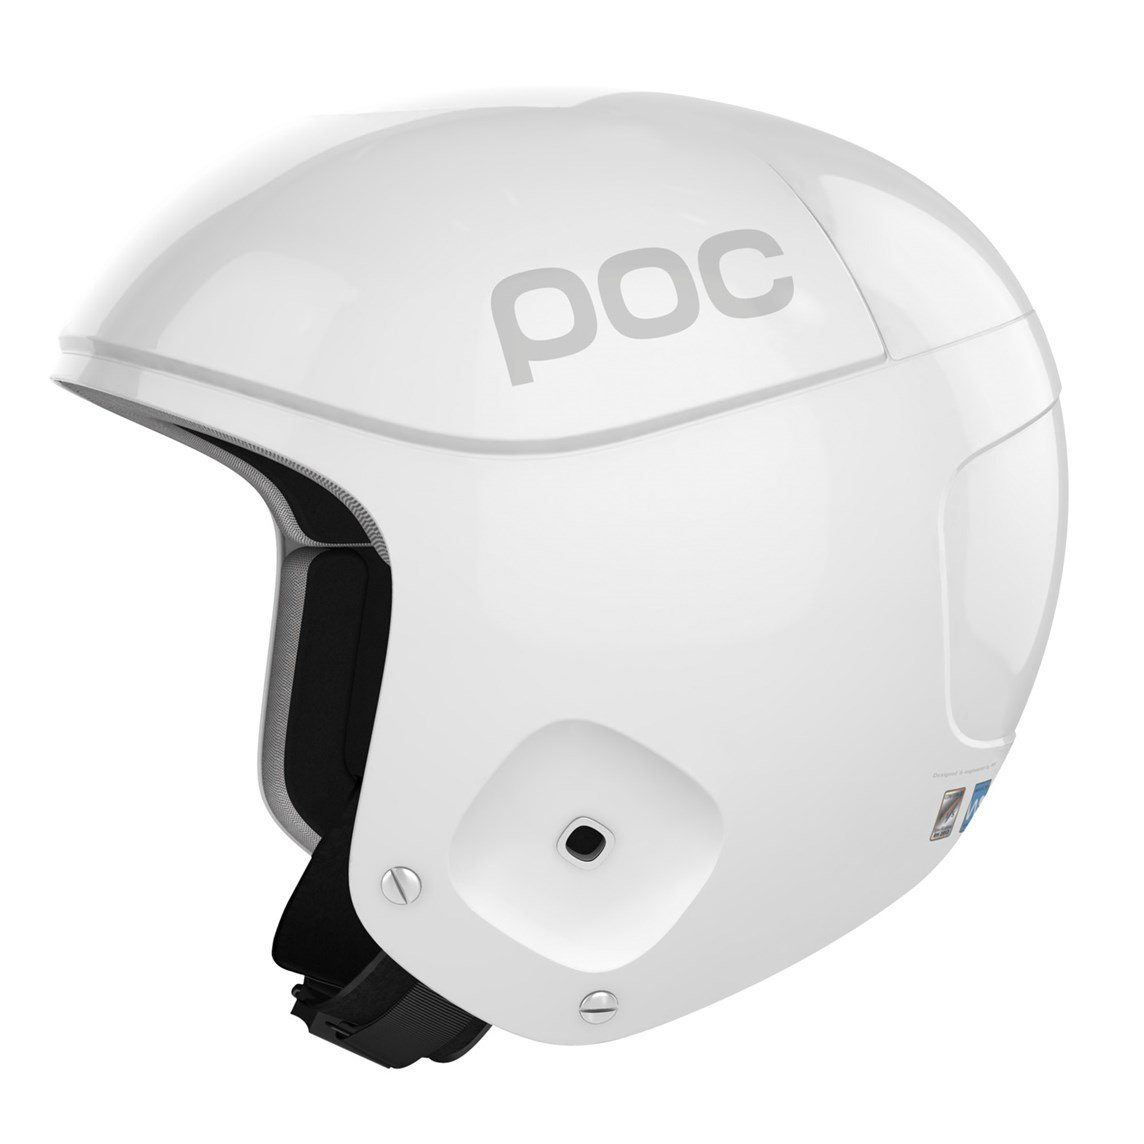 POC Skull Orbic X Casco de esquí unisex